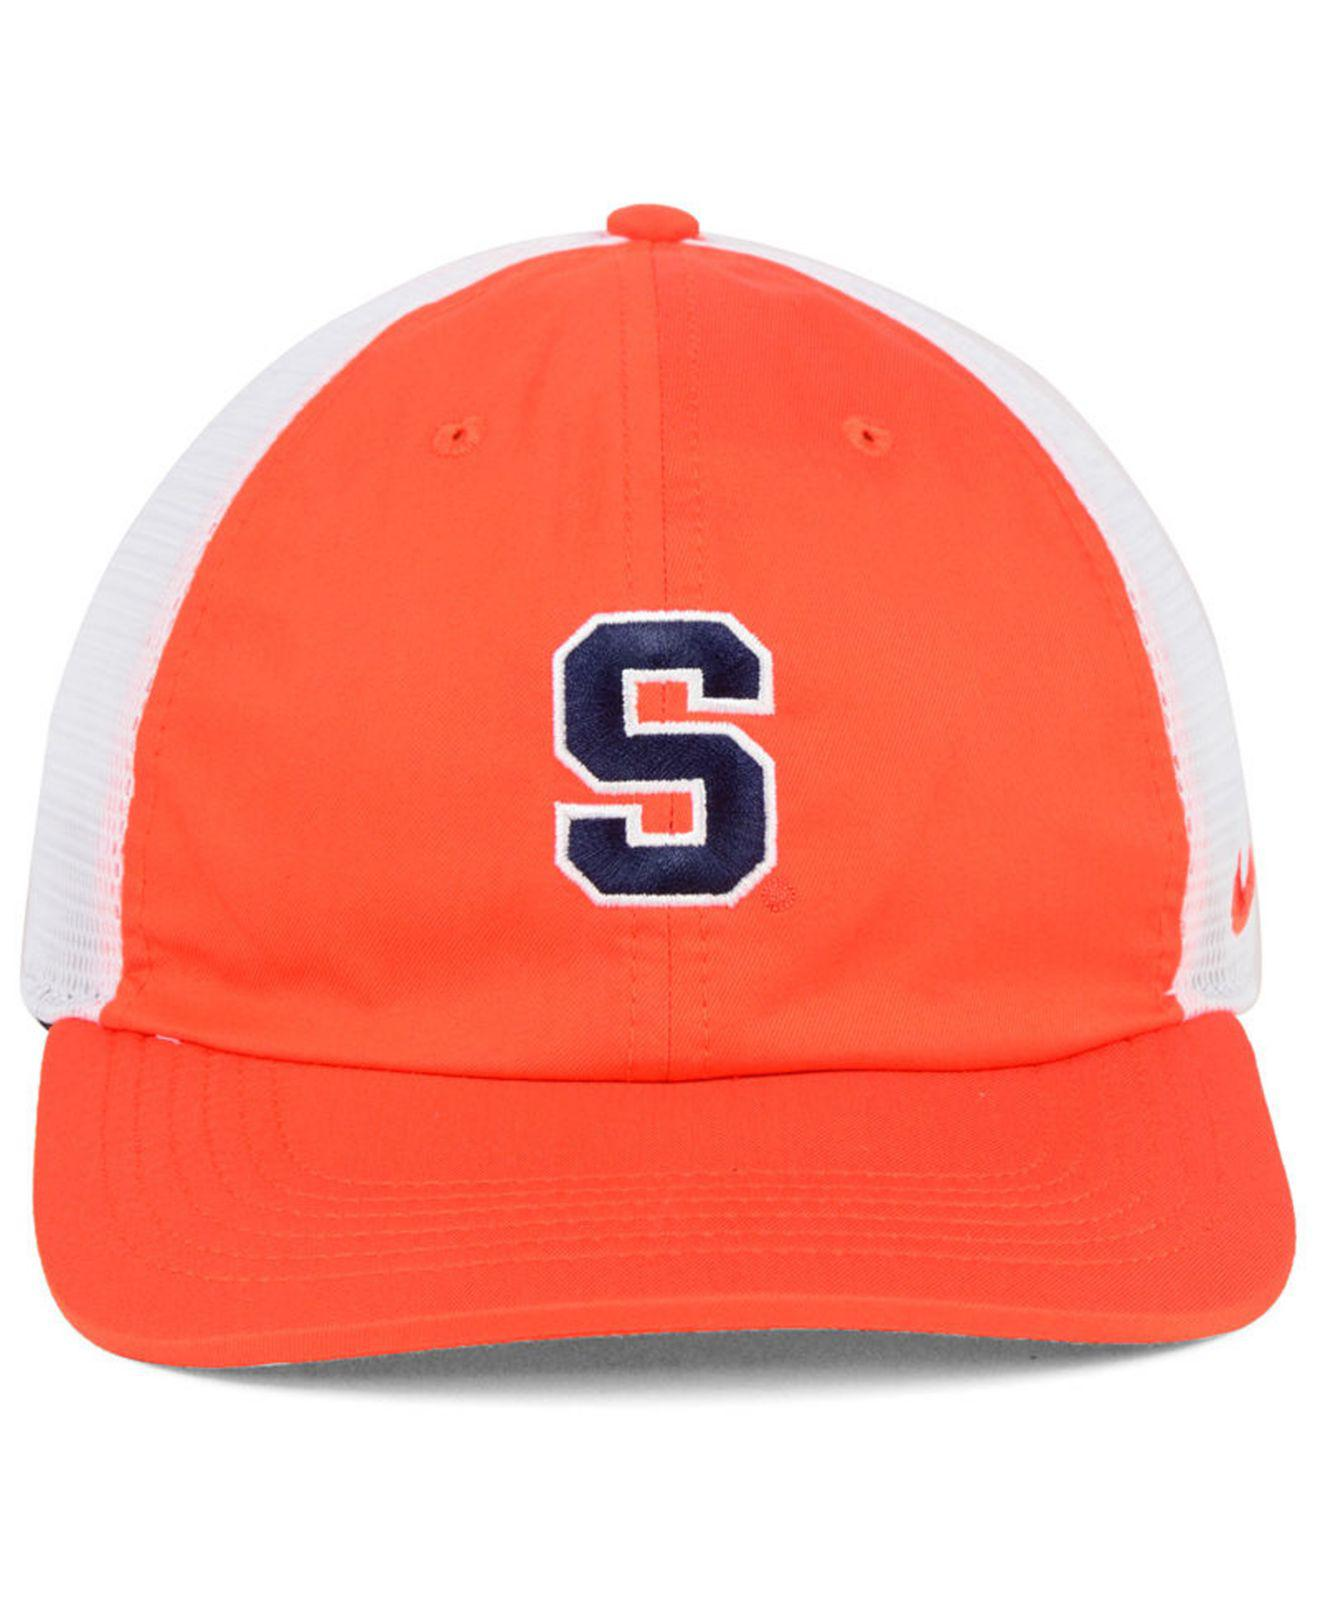 more photos 1df74 b0852 ... best price lyst nike syracuse orange h86 trucker snapback cap in orange  for men 2caa1 f1704